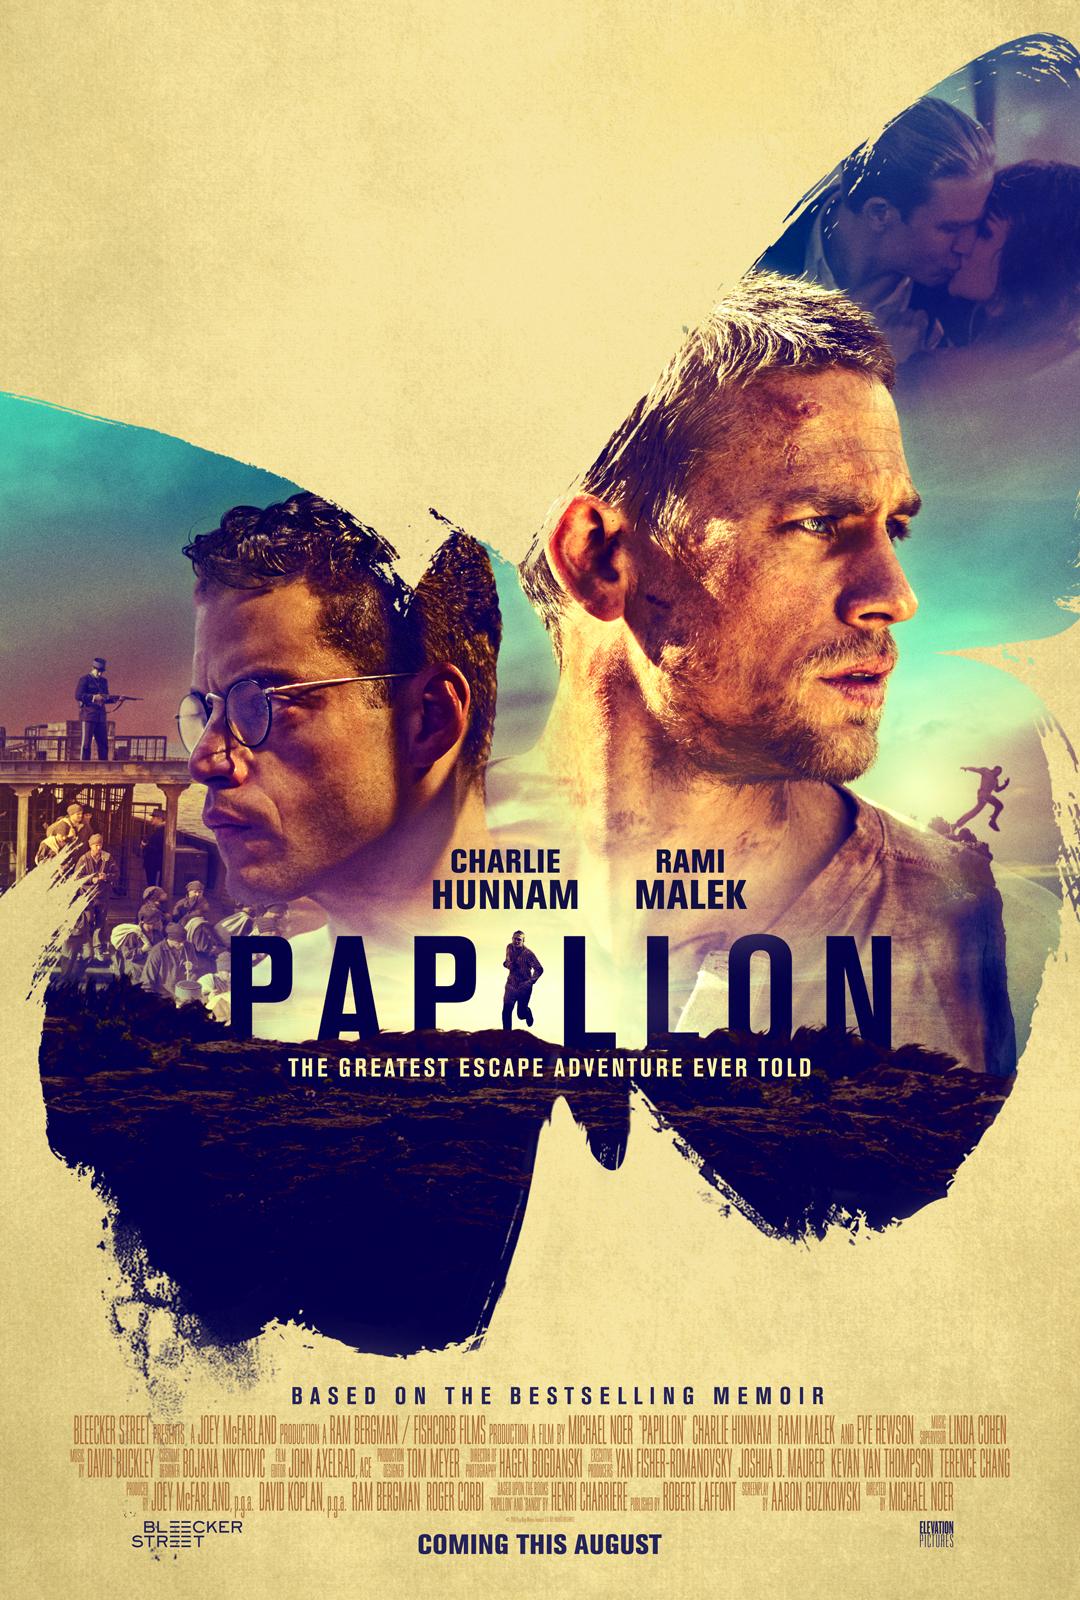 EP_Papillon_KeyArt_Teaser_Cineplex_1080x1600